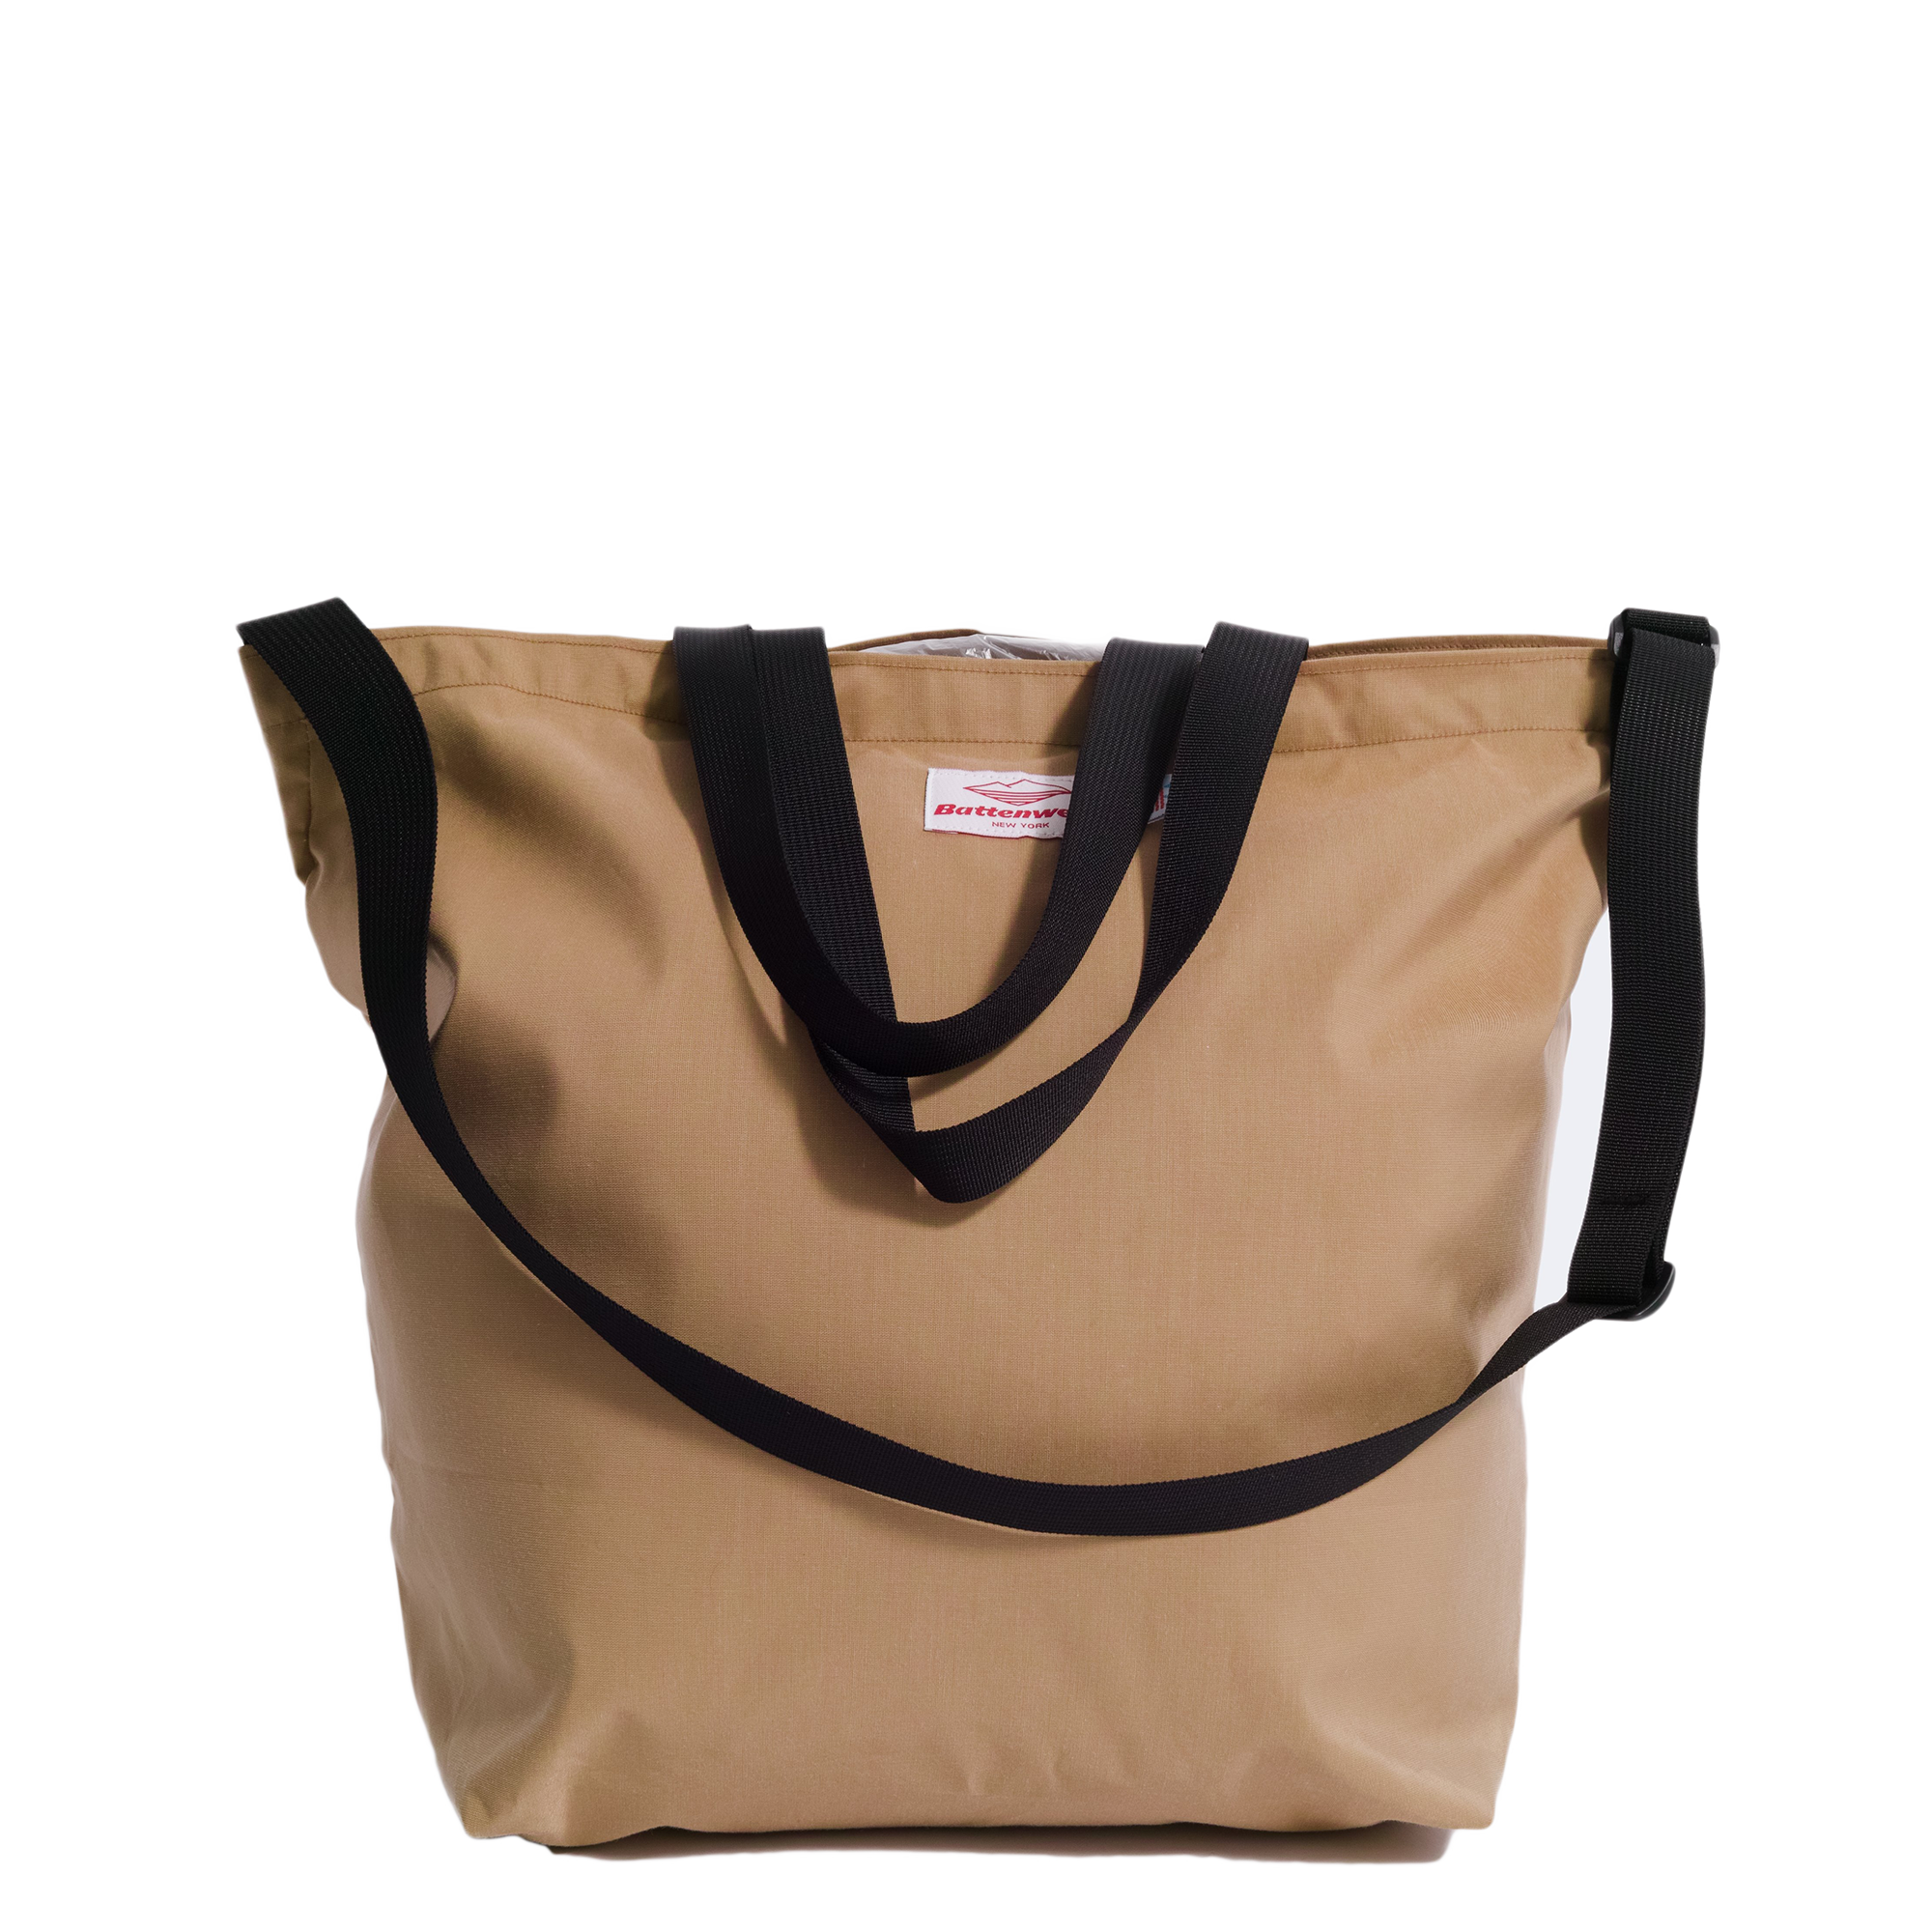 13bdf0c3a Unisex Battenwear Packable Tote Bag - Khaki | Garmentory